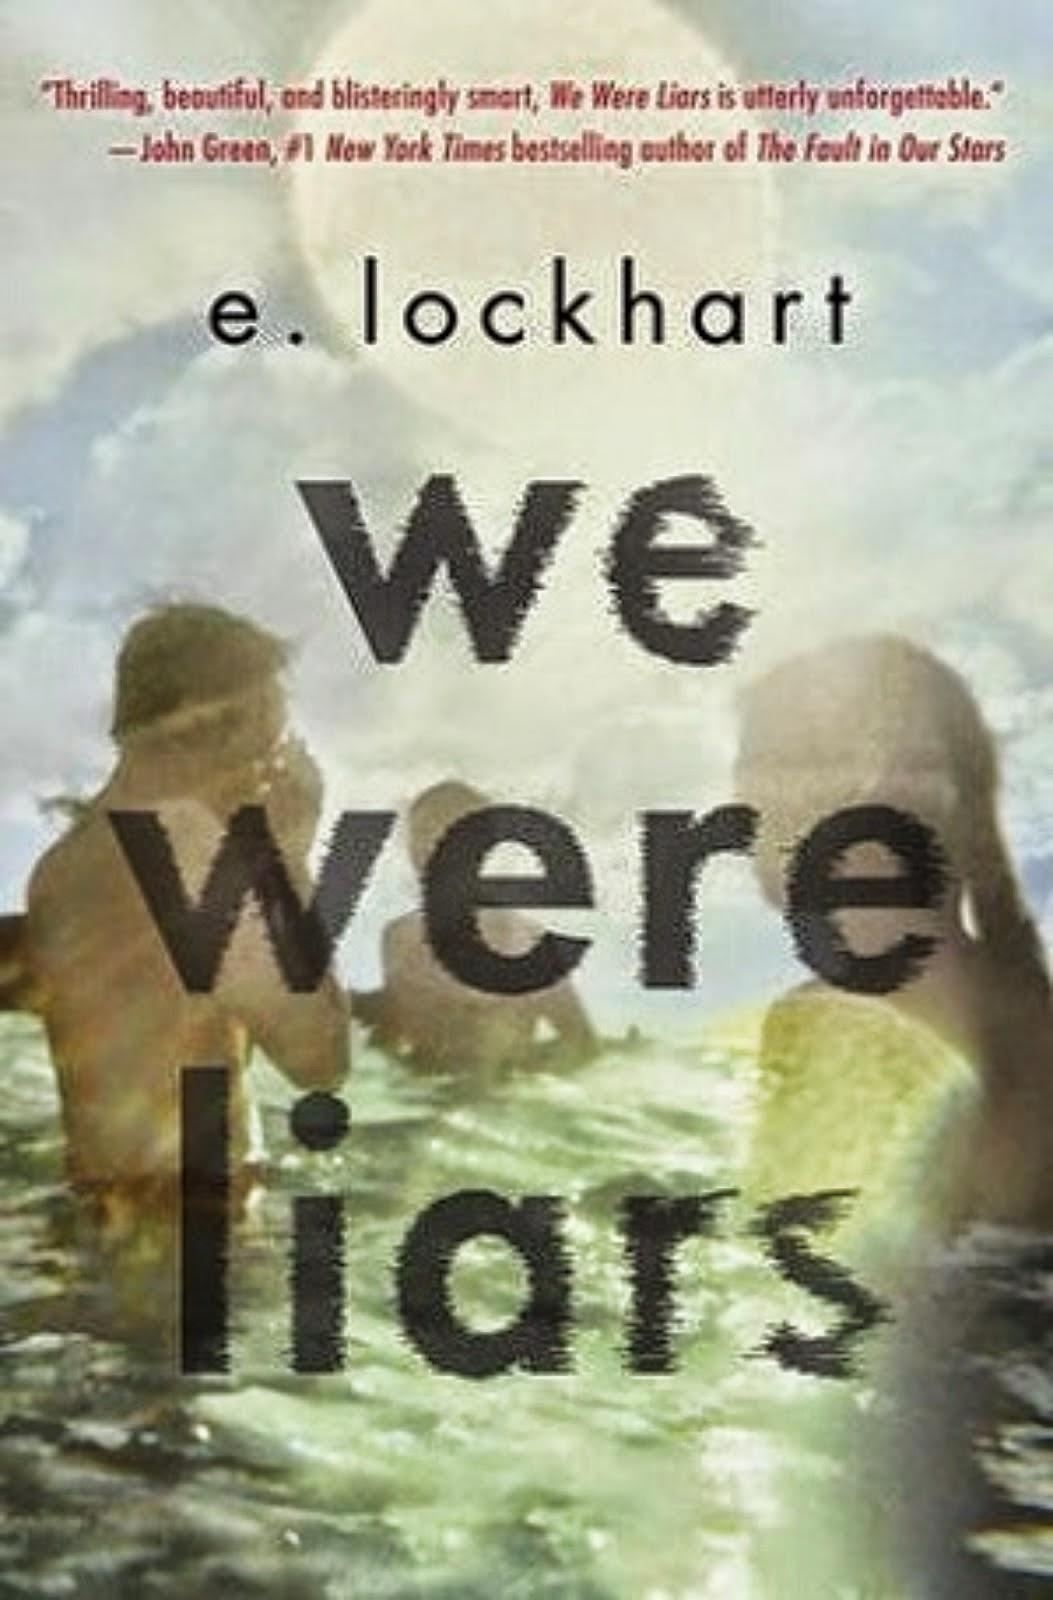 http://lavidadeunalectoraa.blogspot.mx/2015/01/resena-we-were-liars-de-e-lockhart.html